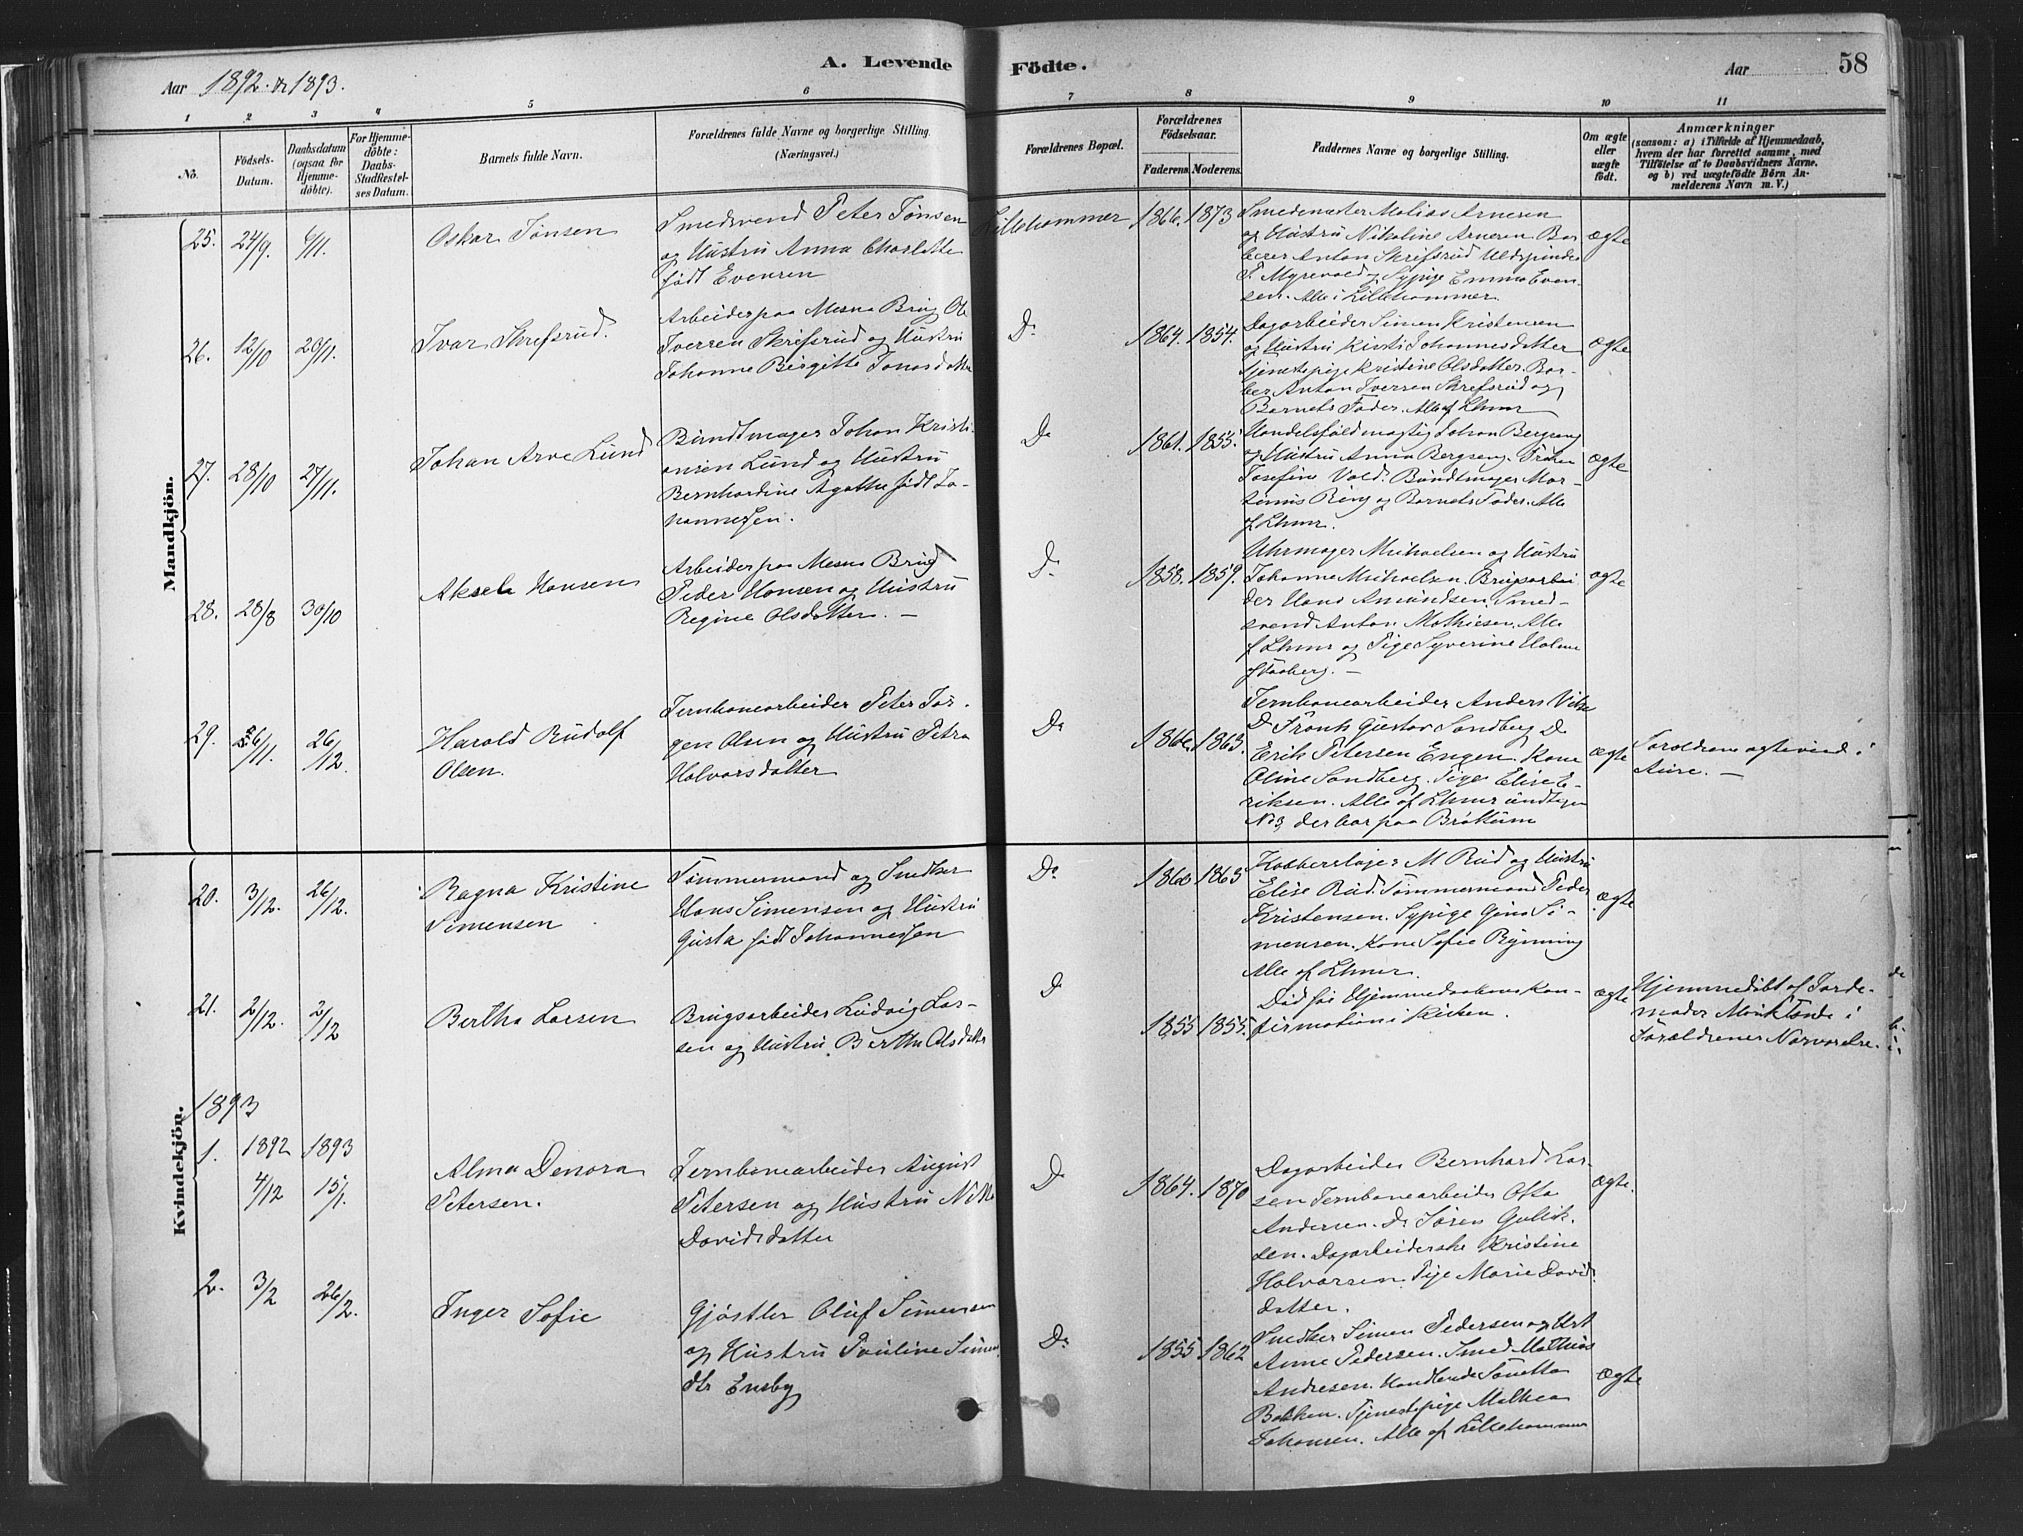 SAH, Fåberg prestekontor, Ministerialbok nr. 10, 1879-1900, s. 58